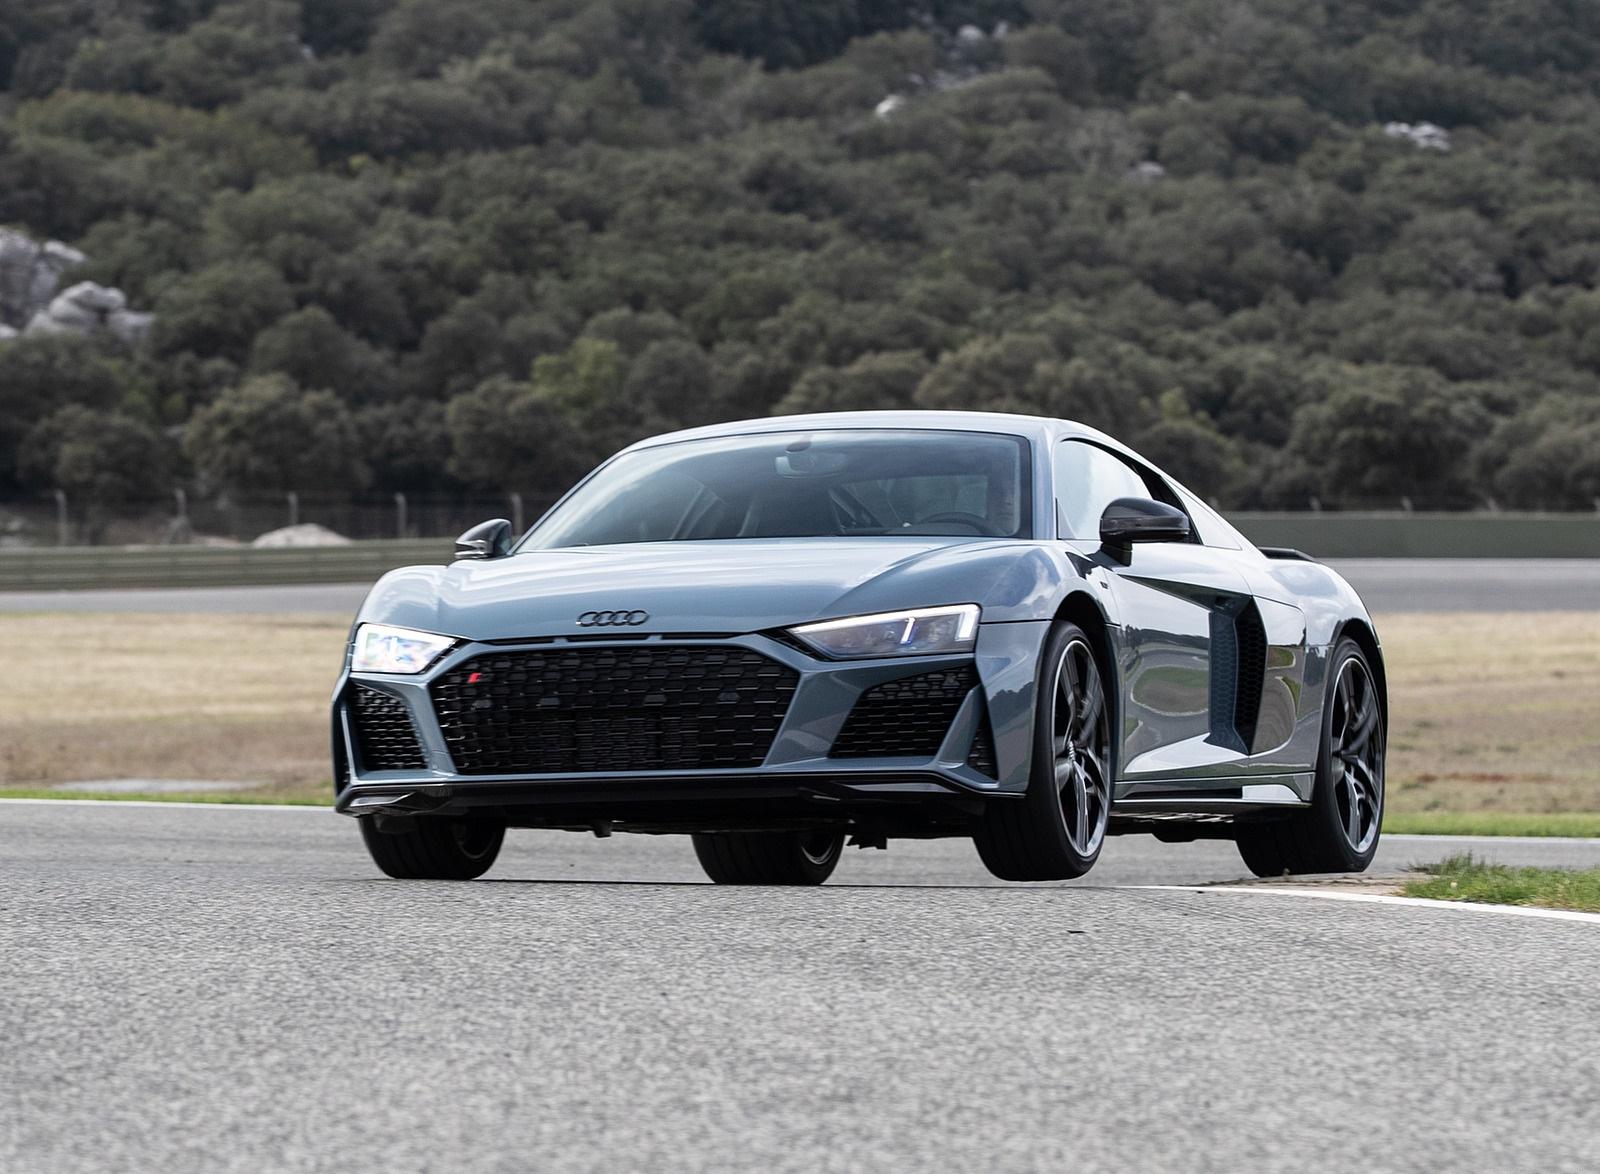 2019 Audi R8 V10 Coupe Color Kemora Gray Metallic Front Wallpaper